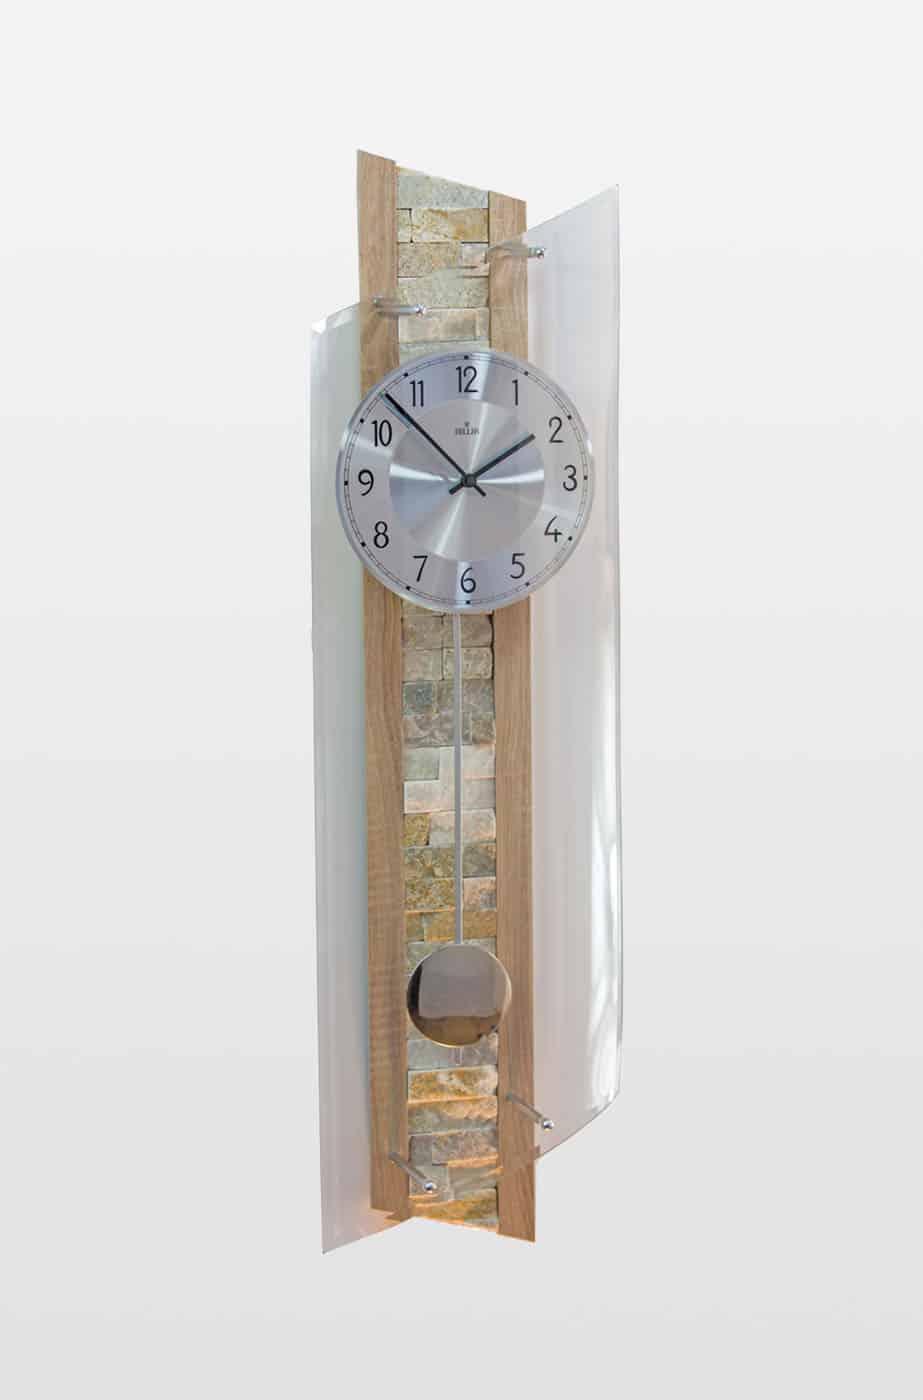 QC 9141 Stylish Tiled Radio Controlled Wall Clock